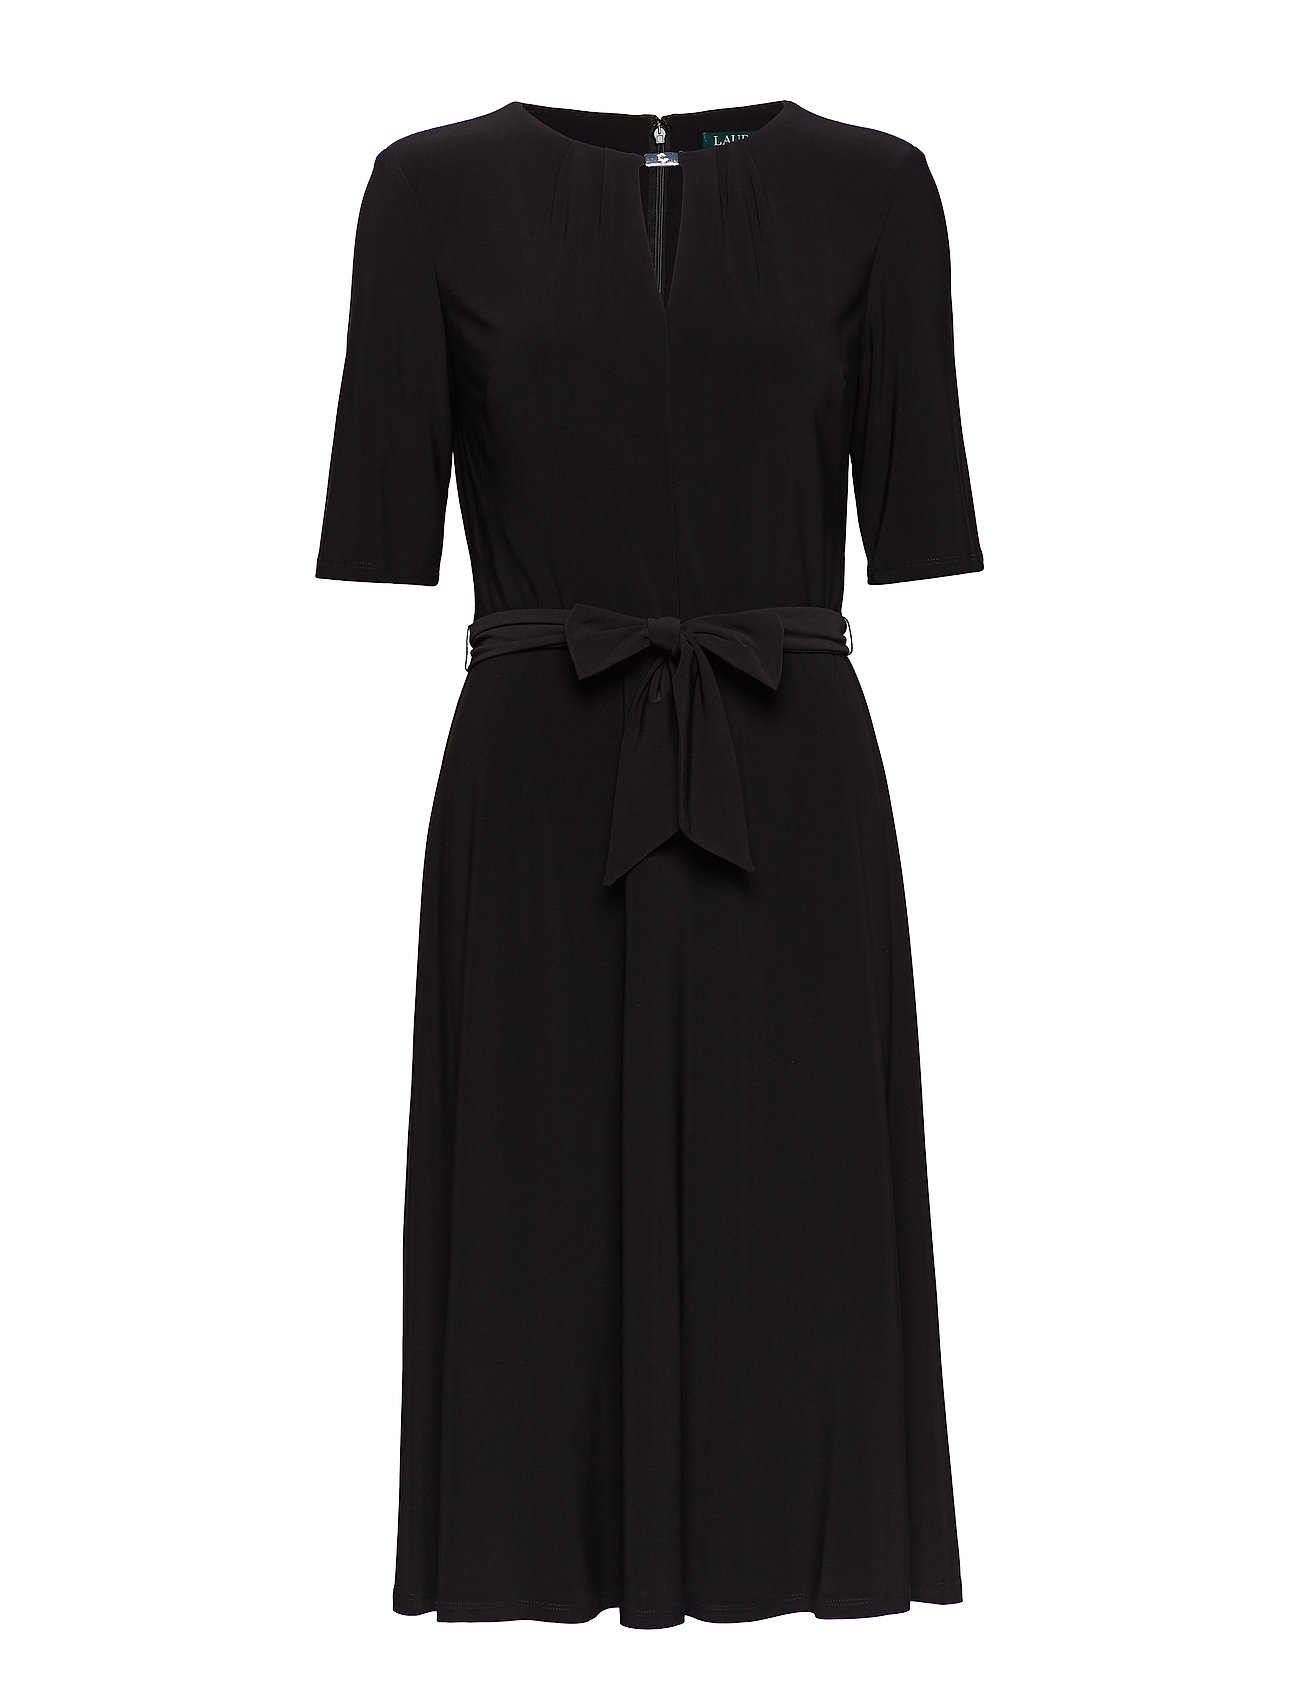 4f1cf679115 4r-matte Jersey-chicky W  Trim (Black) (179 €) - Lauren Ralph Lauren ...